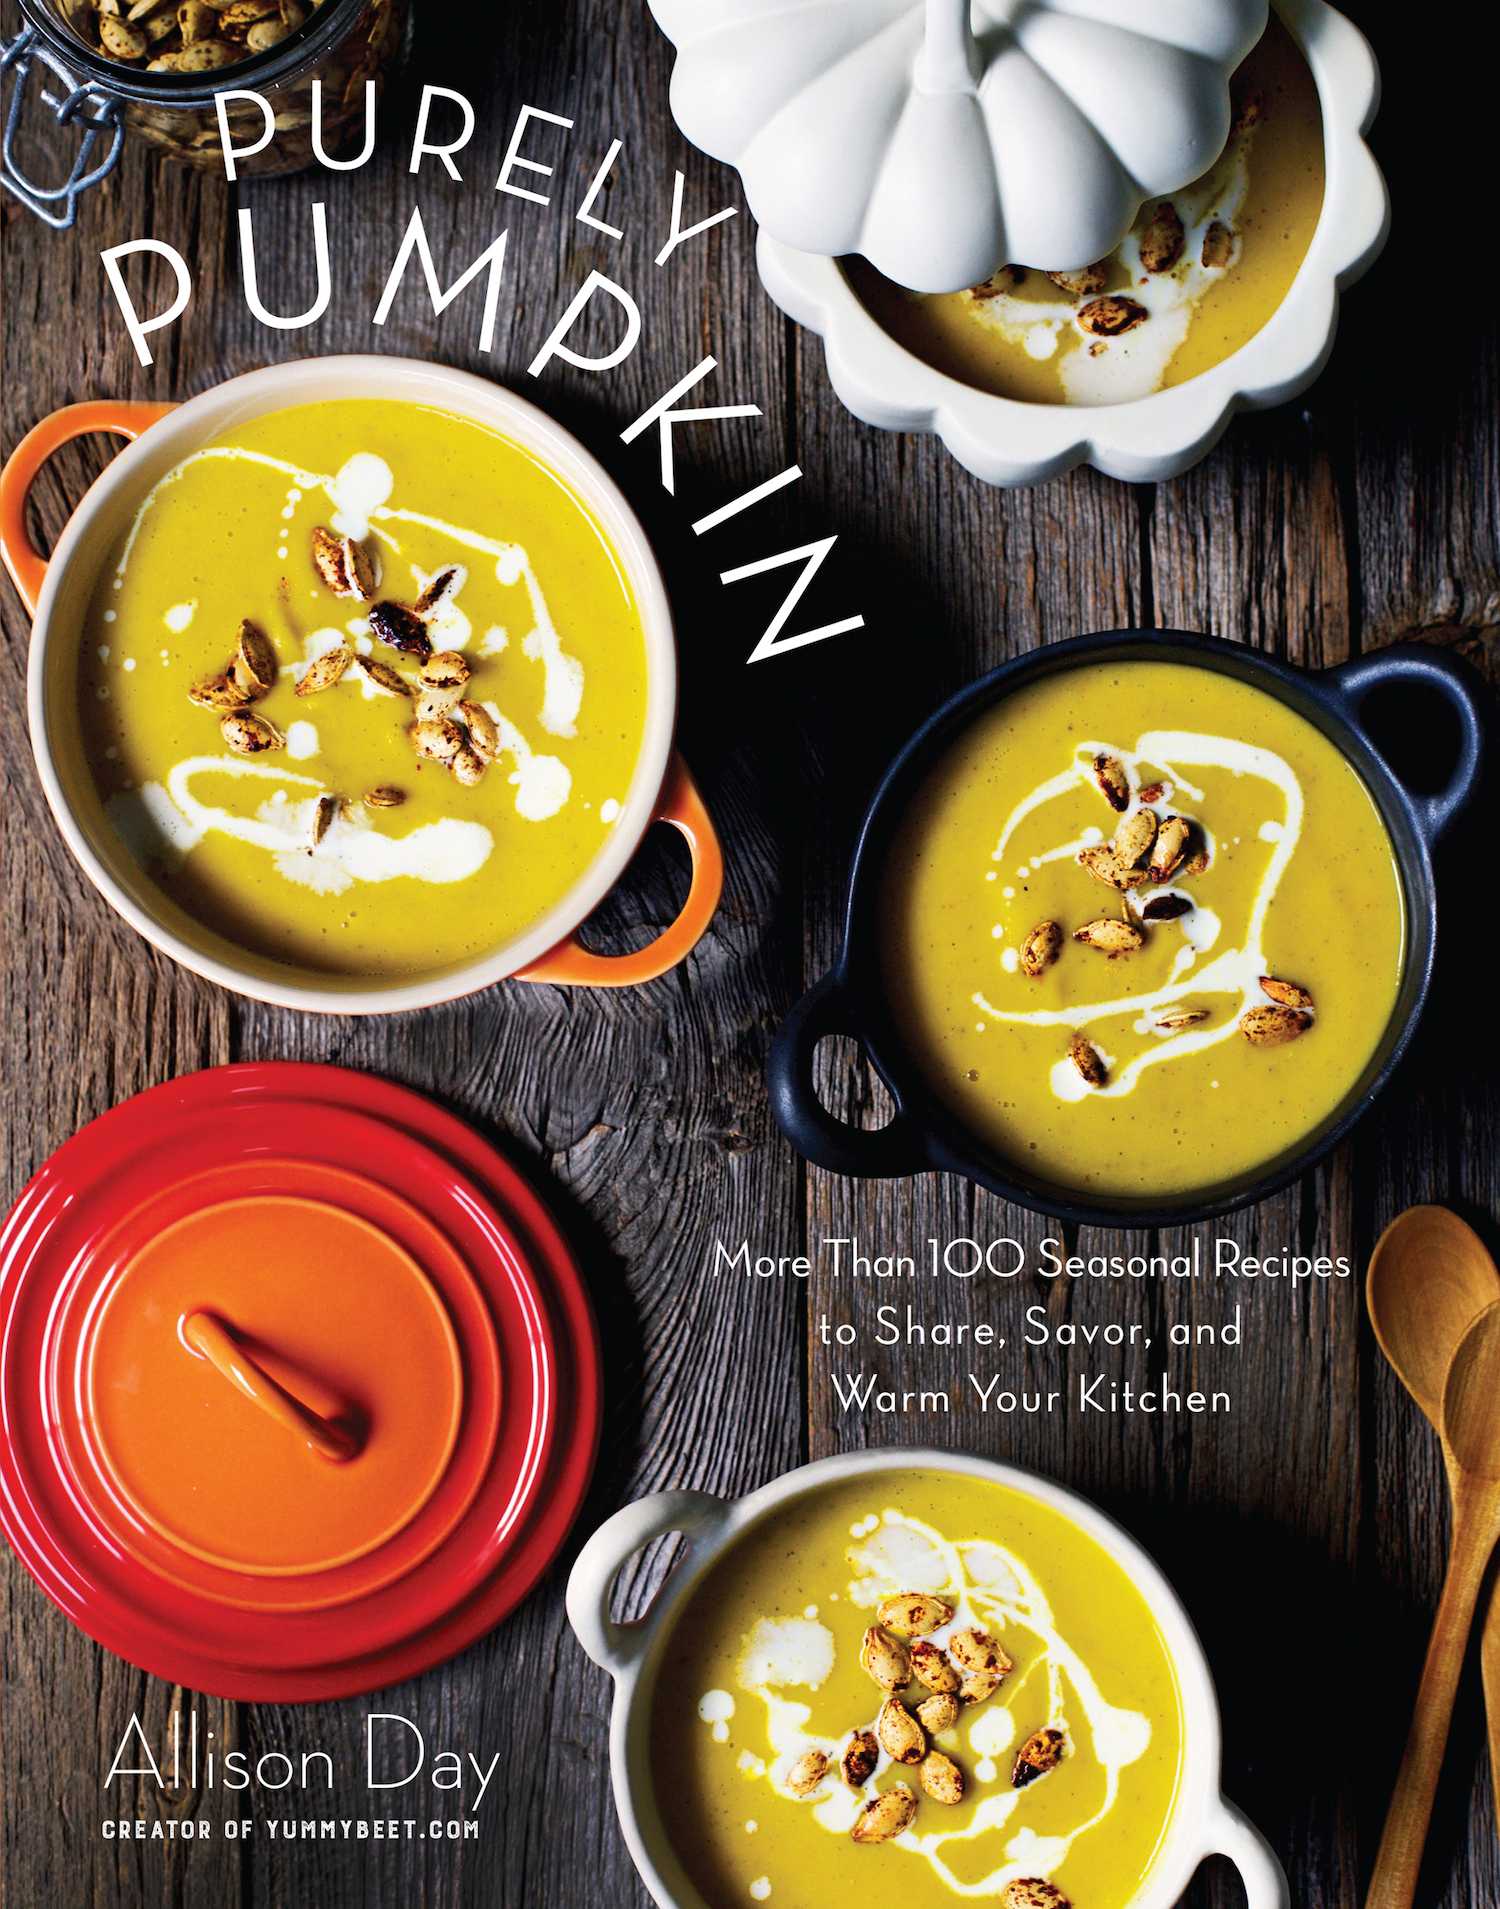 Purely Pumpkin.jpg